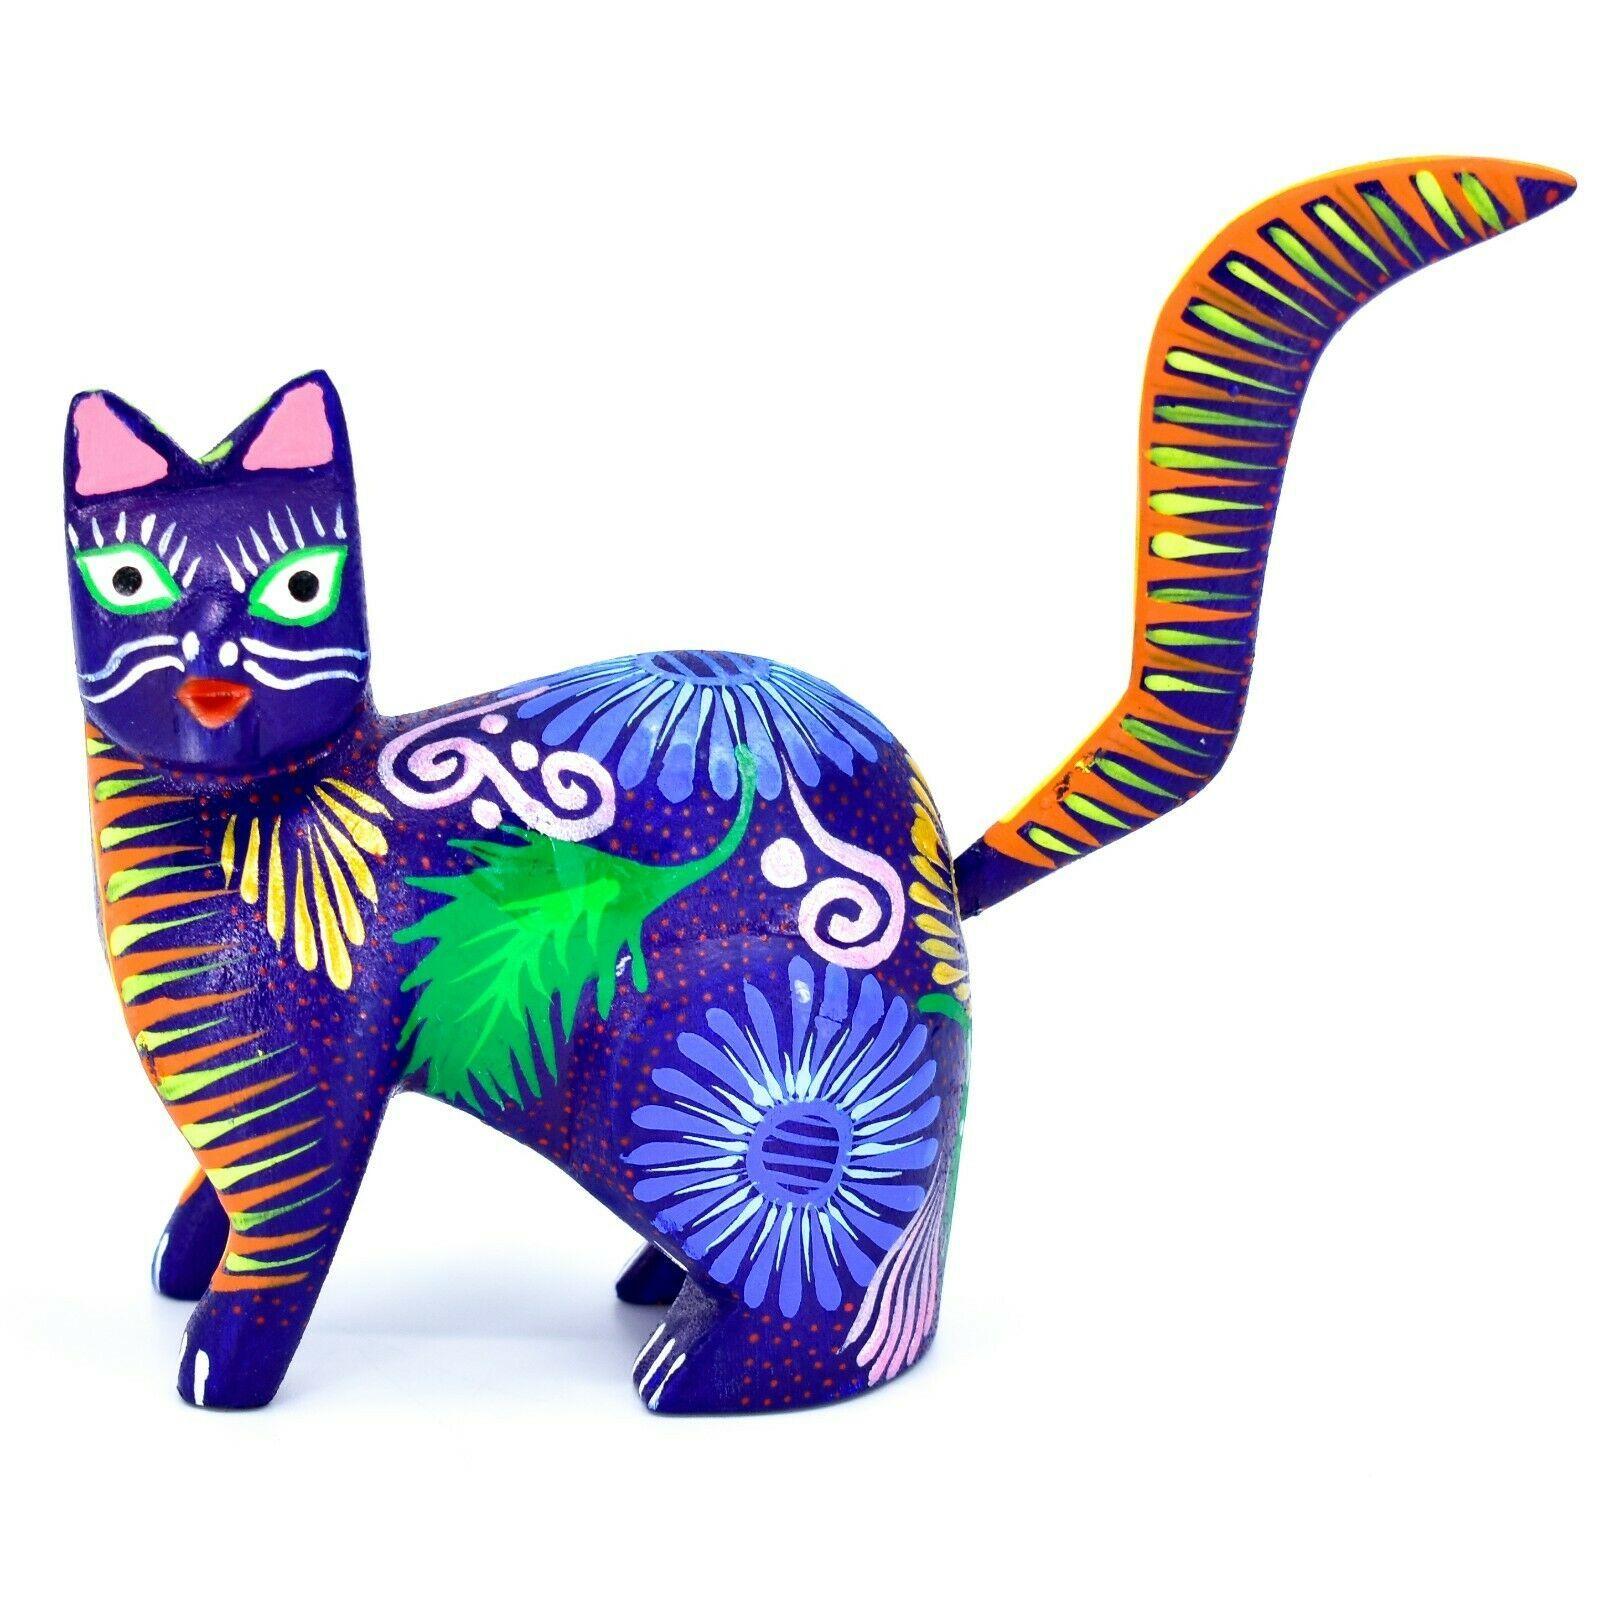 Handmade Alebrijes Oaxacan Copal Wood Carving Painted Cat Kitten Figurine